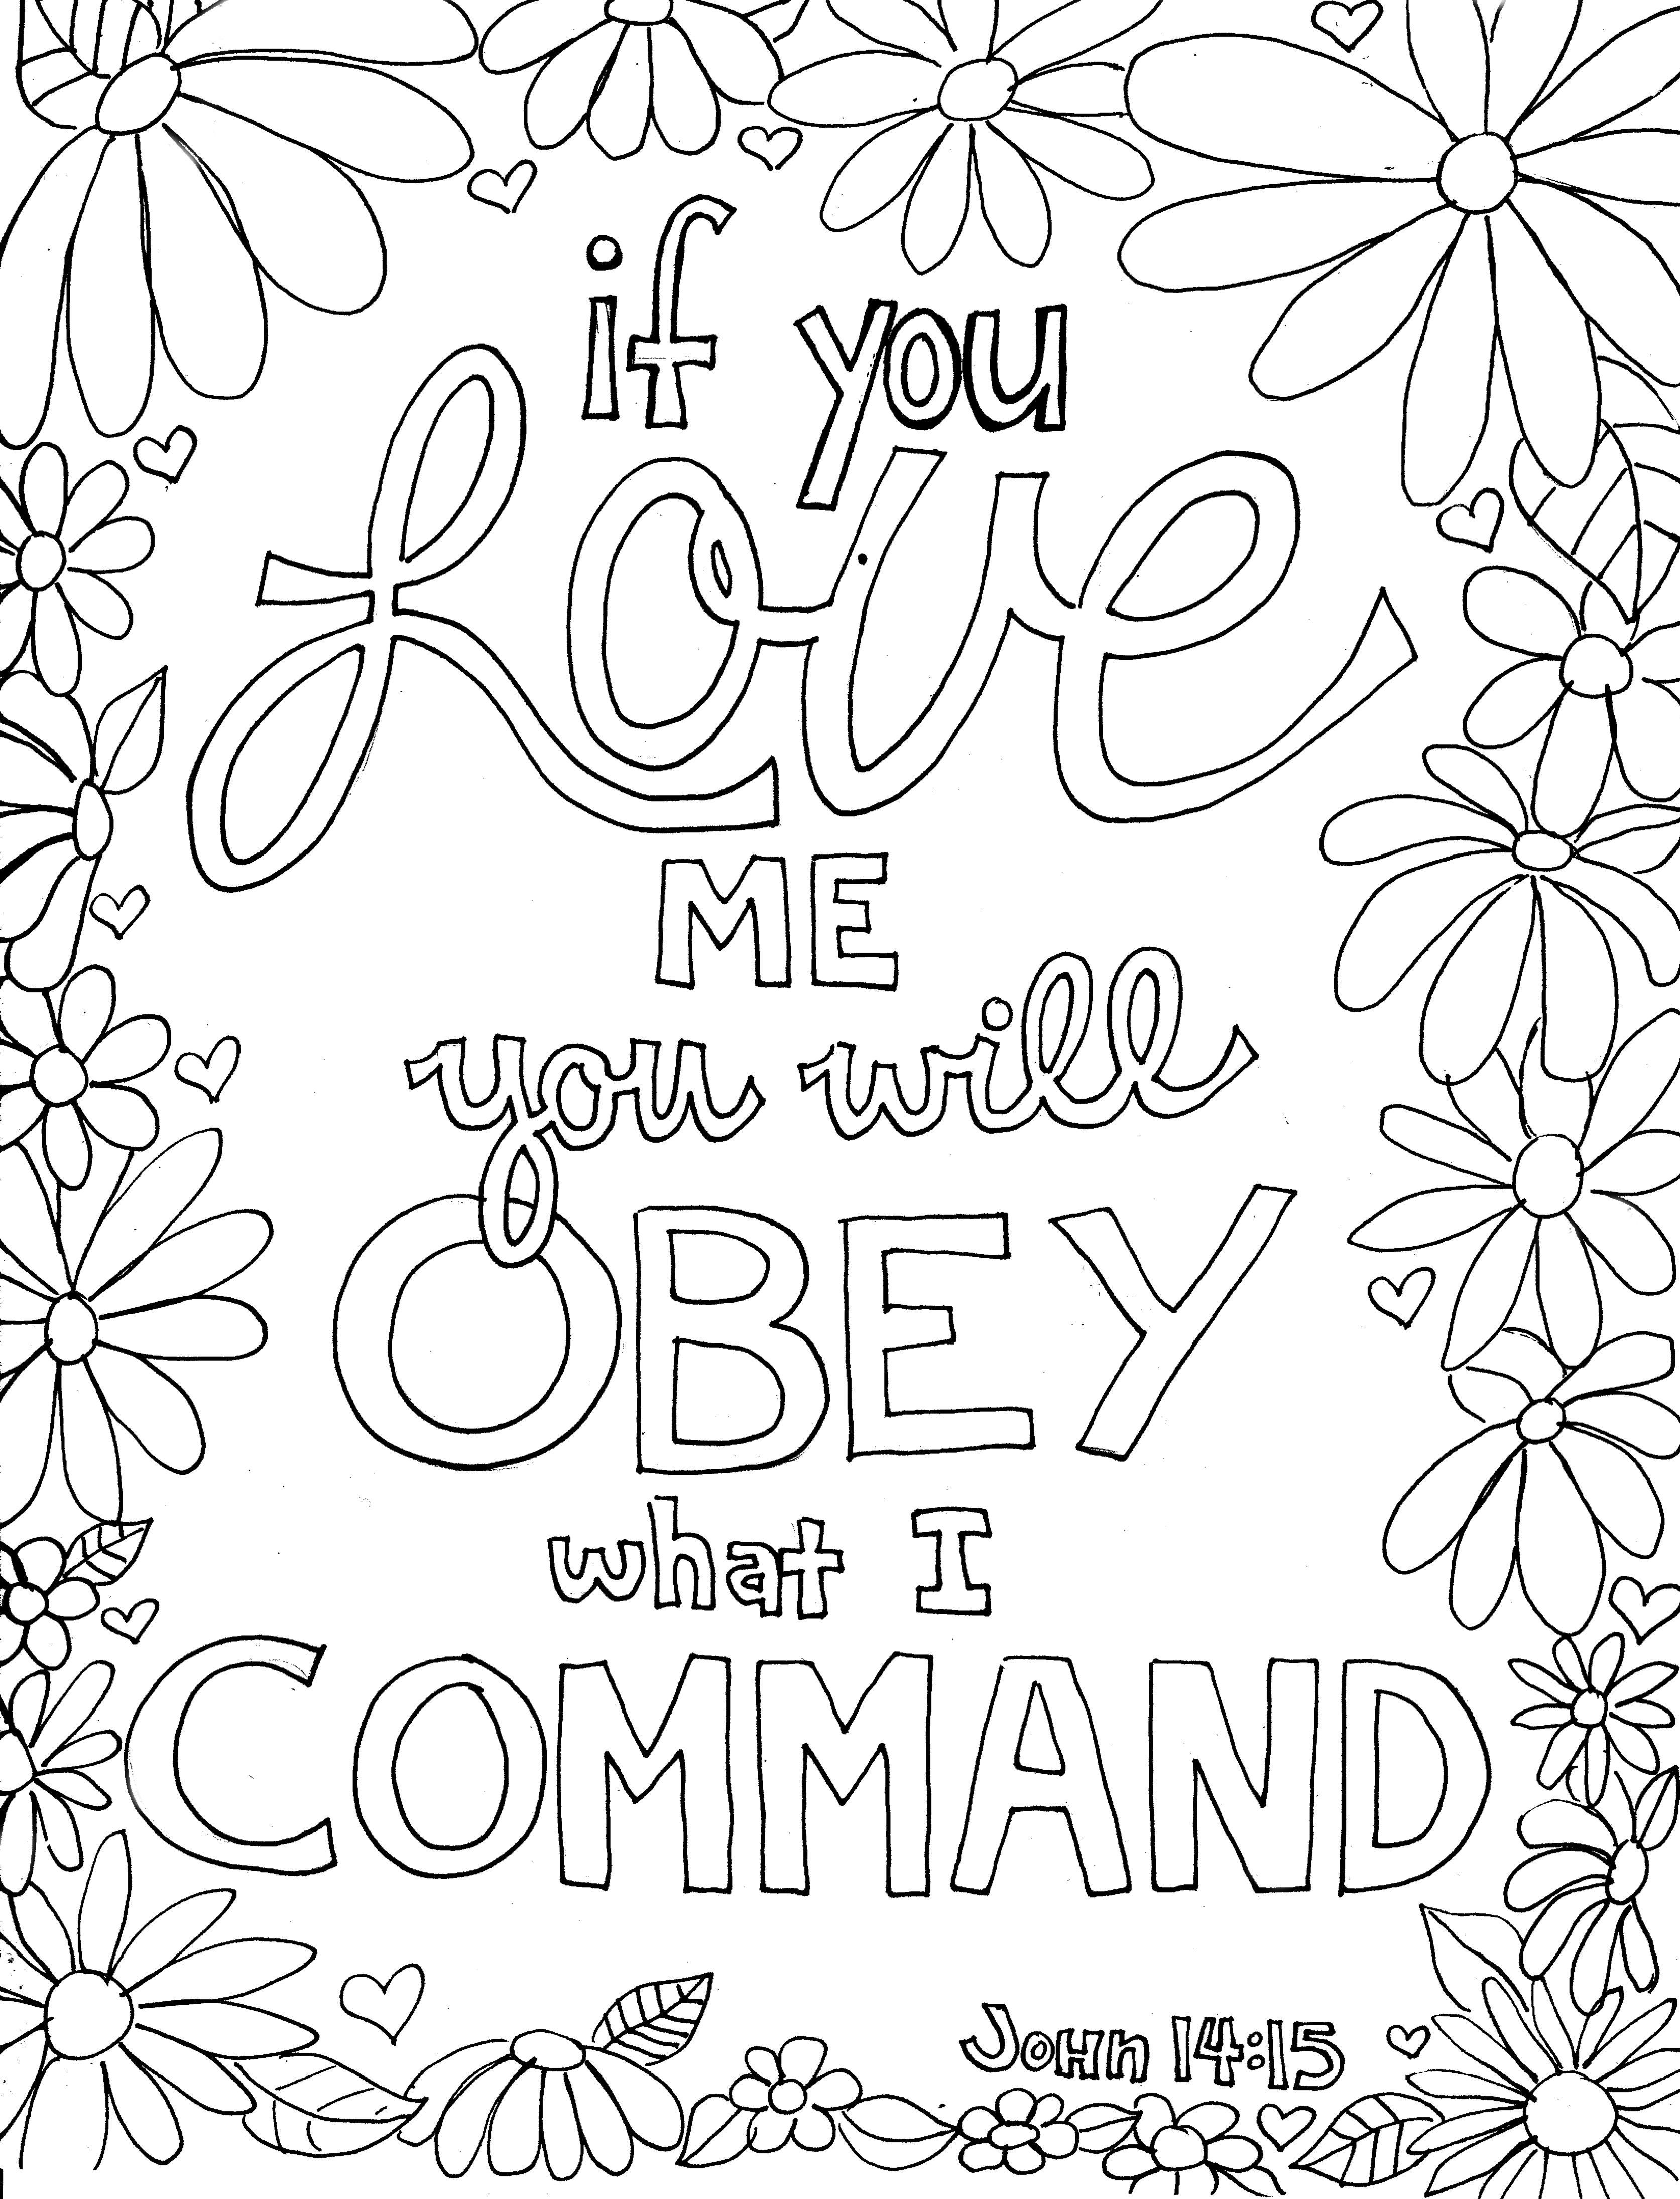 If You Love Me Scripture Doodle Scripture Coloring Bible Verse Coloring Page Bible Coloring Pages